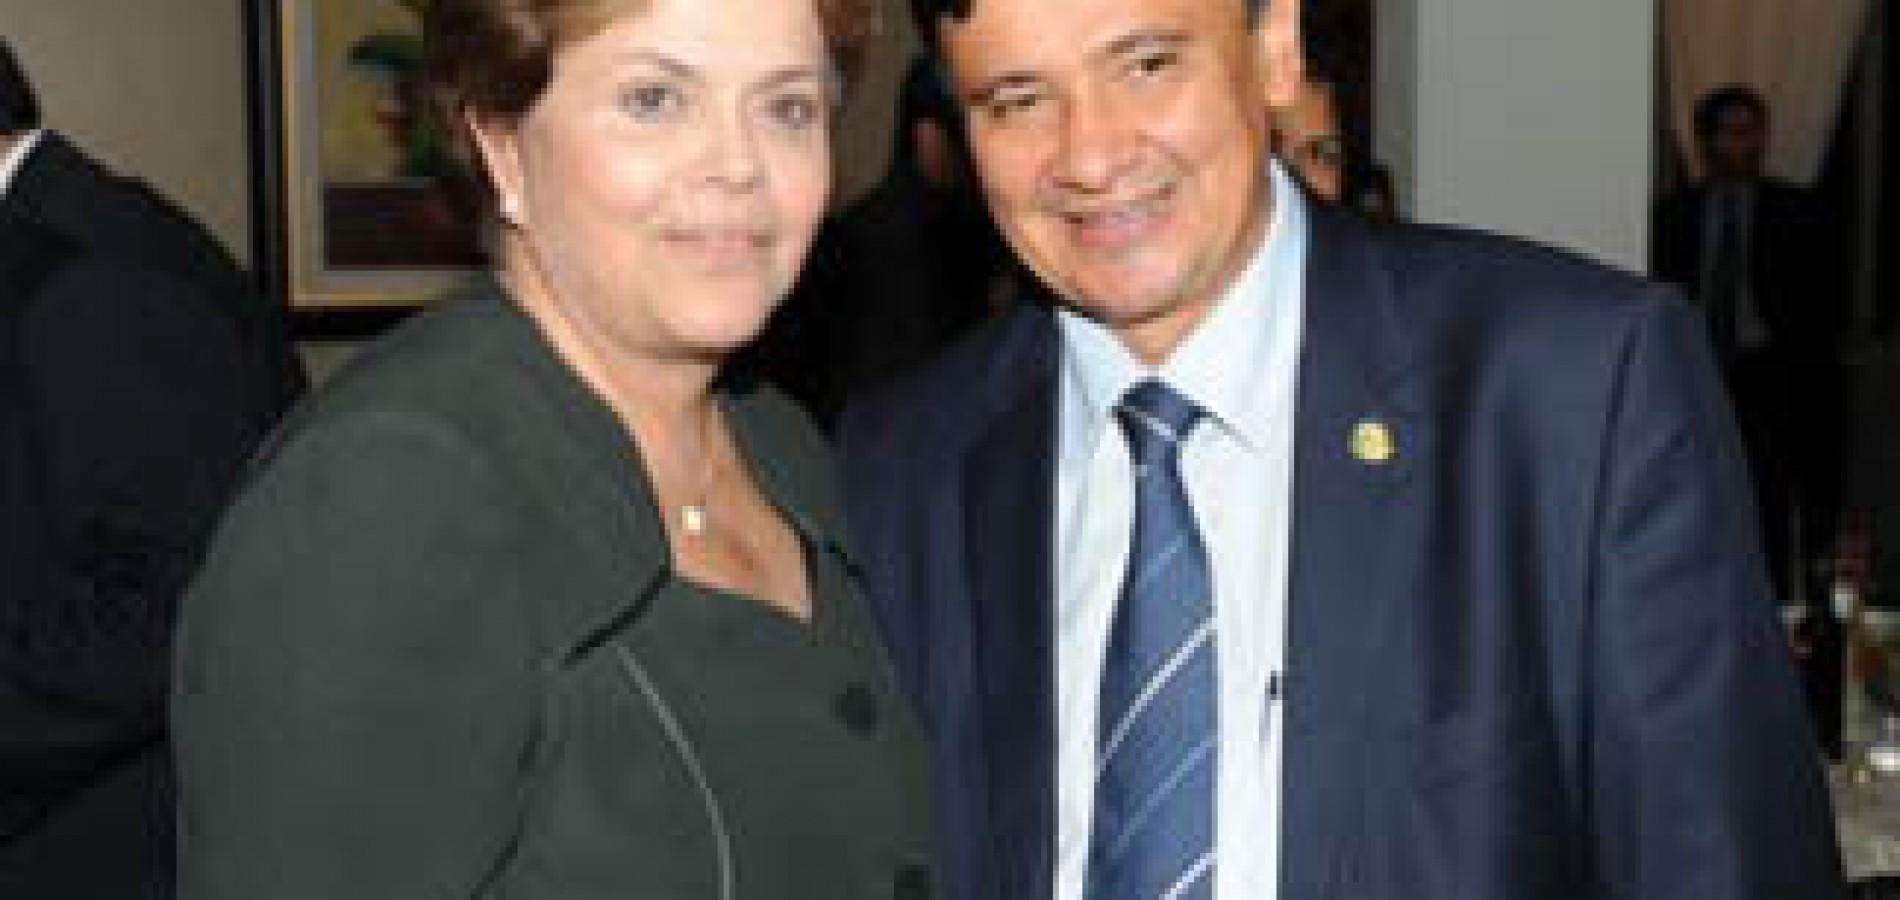 Wellington Dias confirma vinda de Dilma ao Piauí